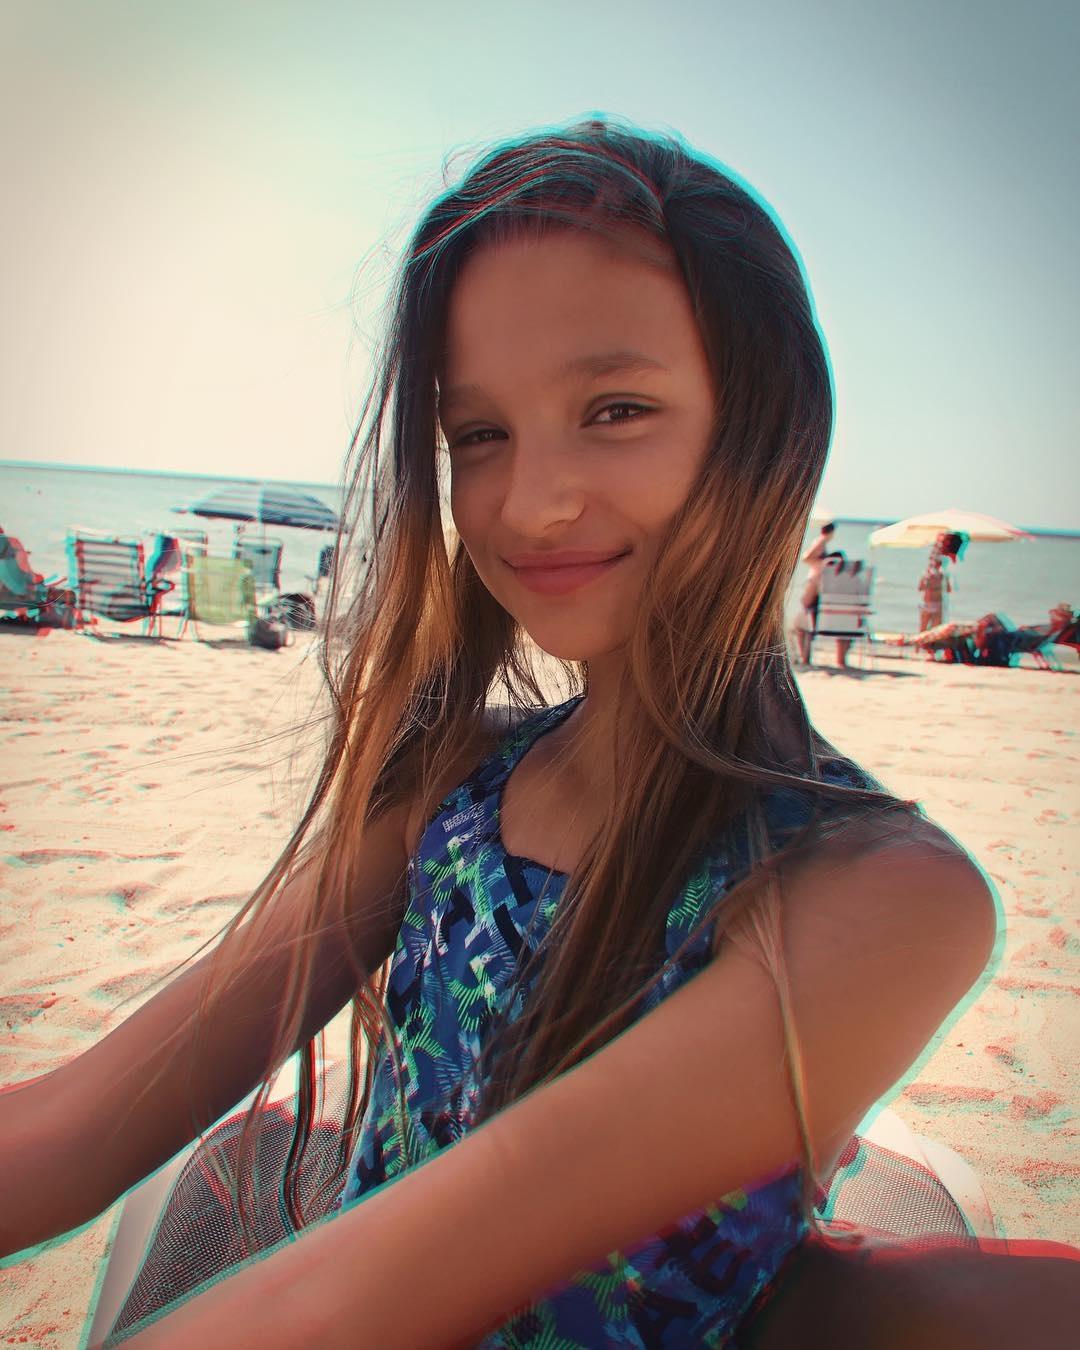 Лиза Анохина в купальнике